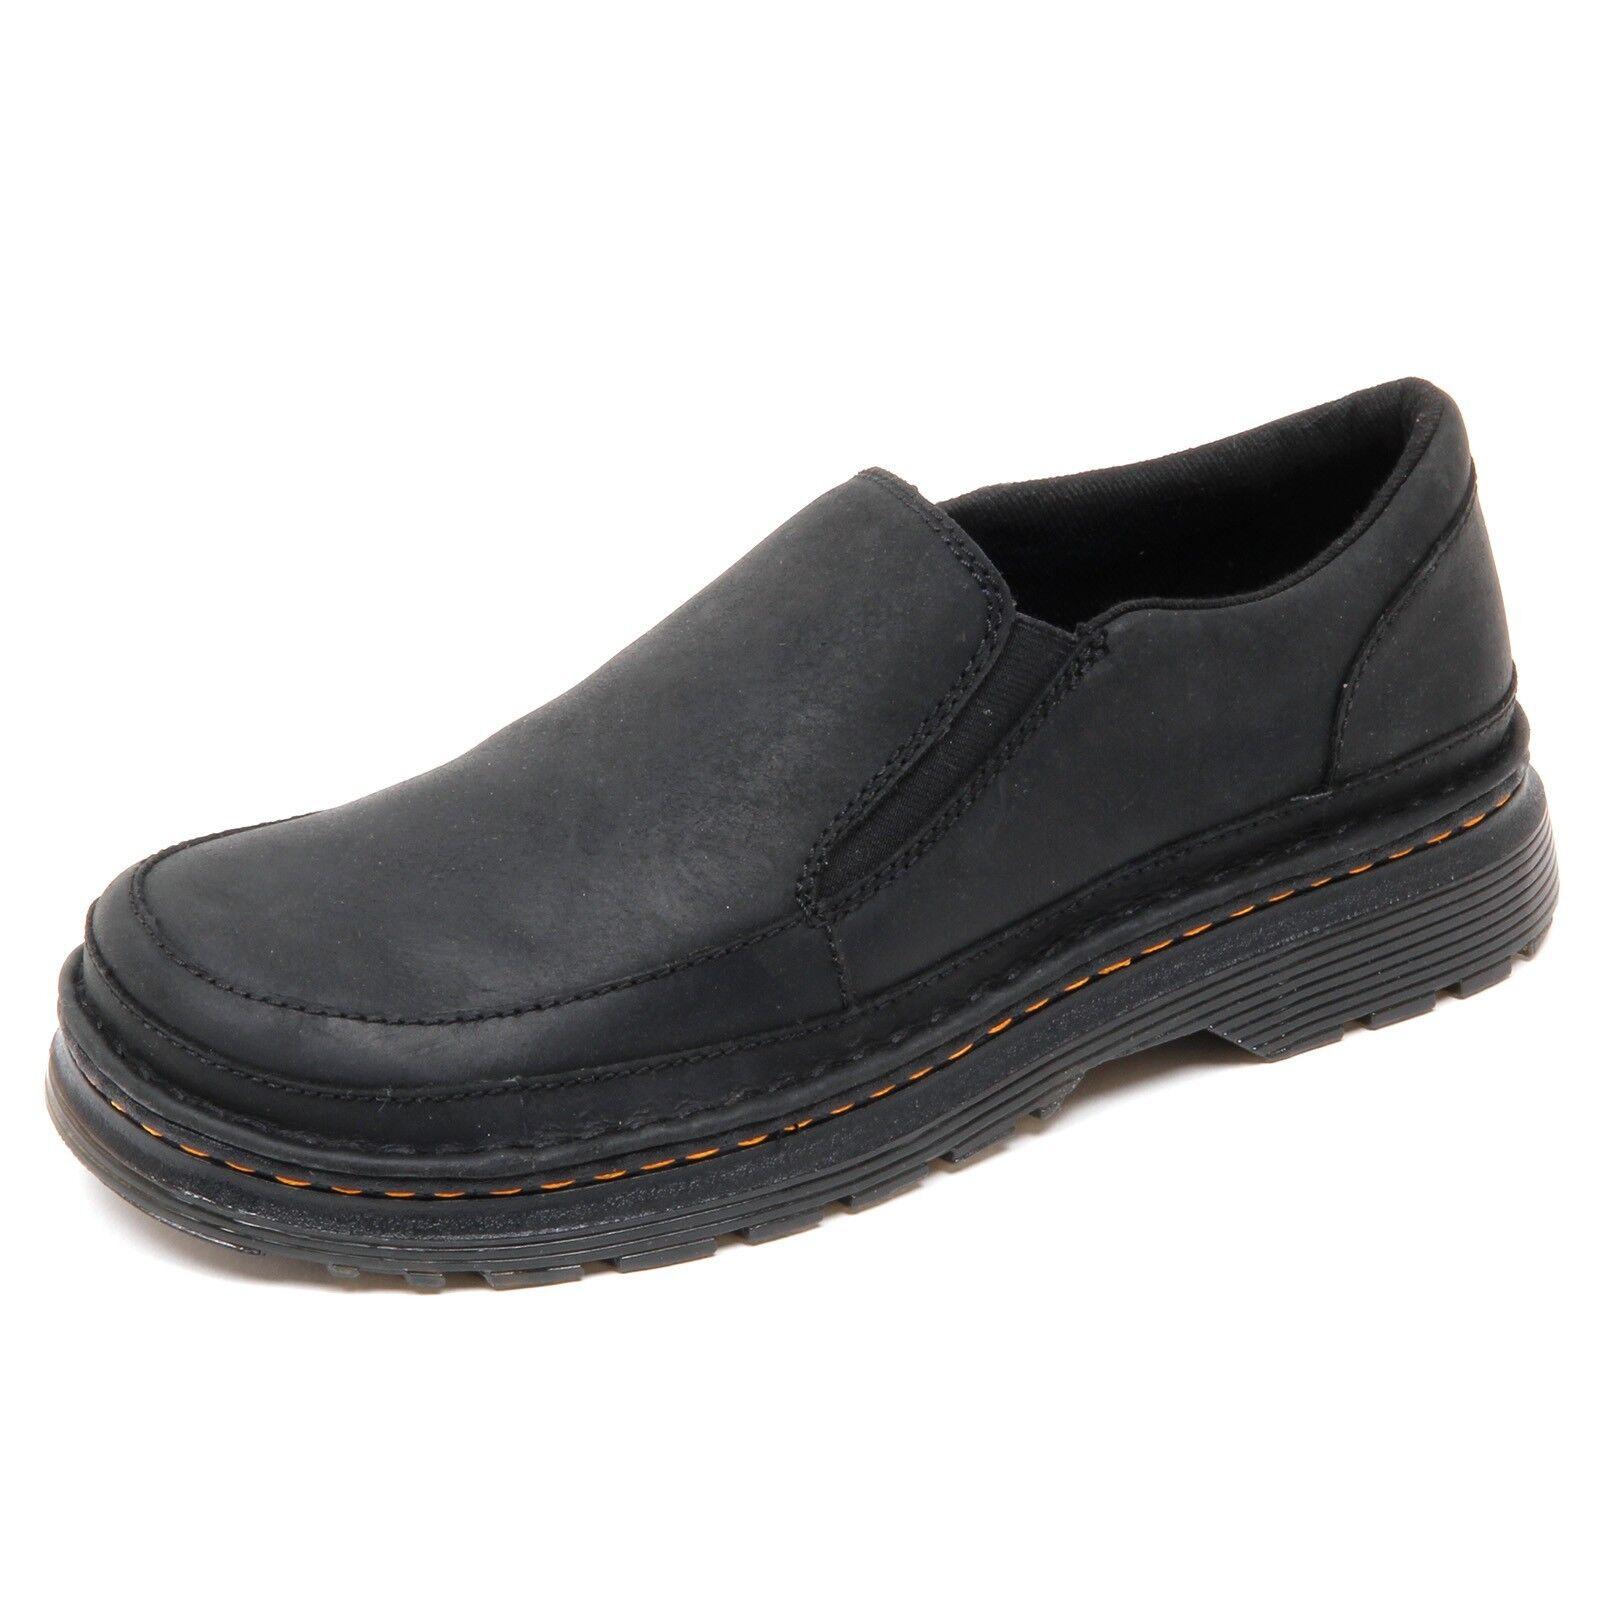 D3776 (without box) scarpa uomo DR. MARTENS nero vintage slip on shoe man